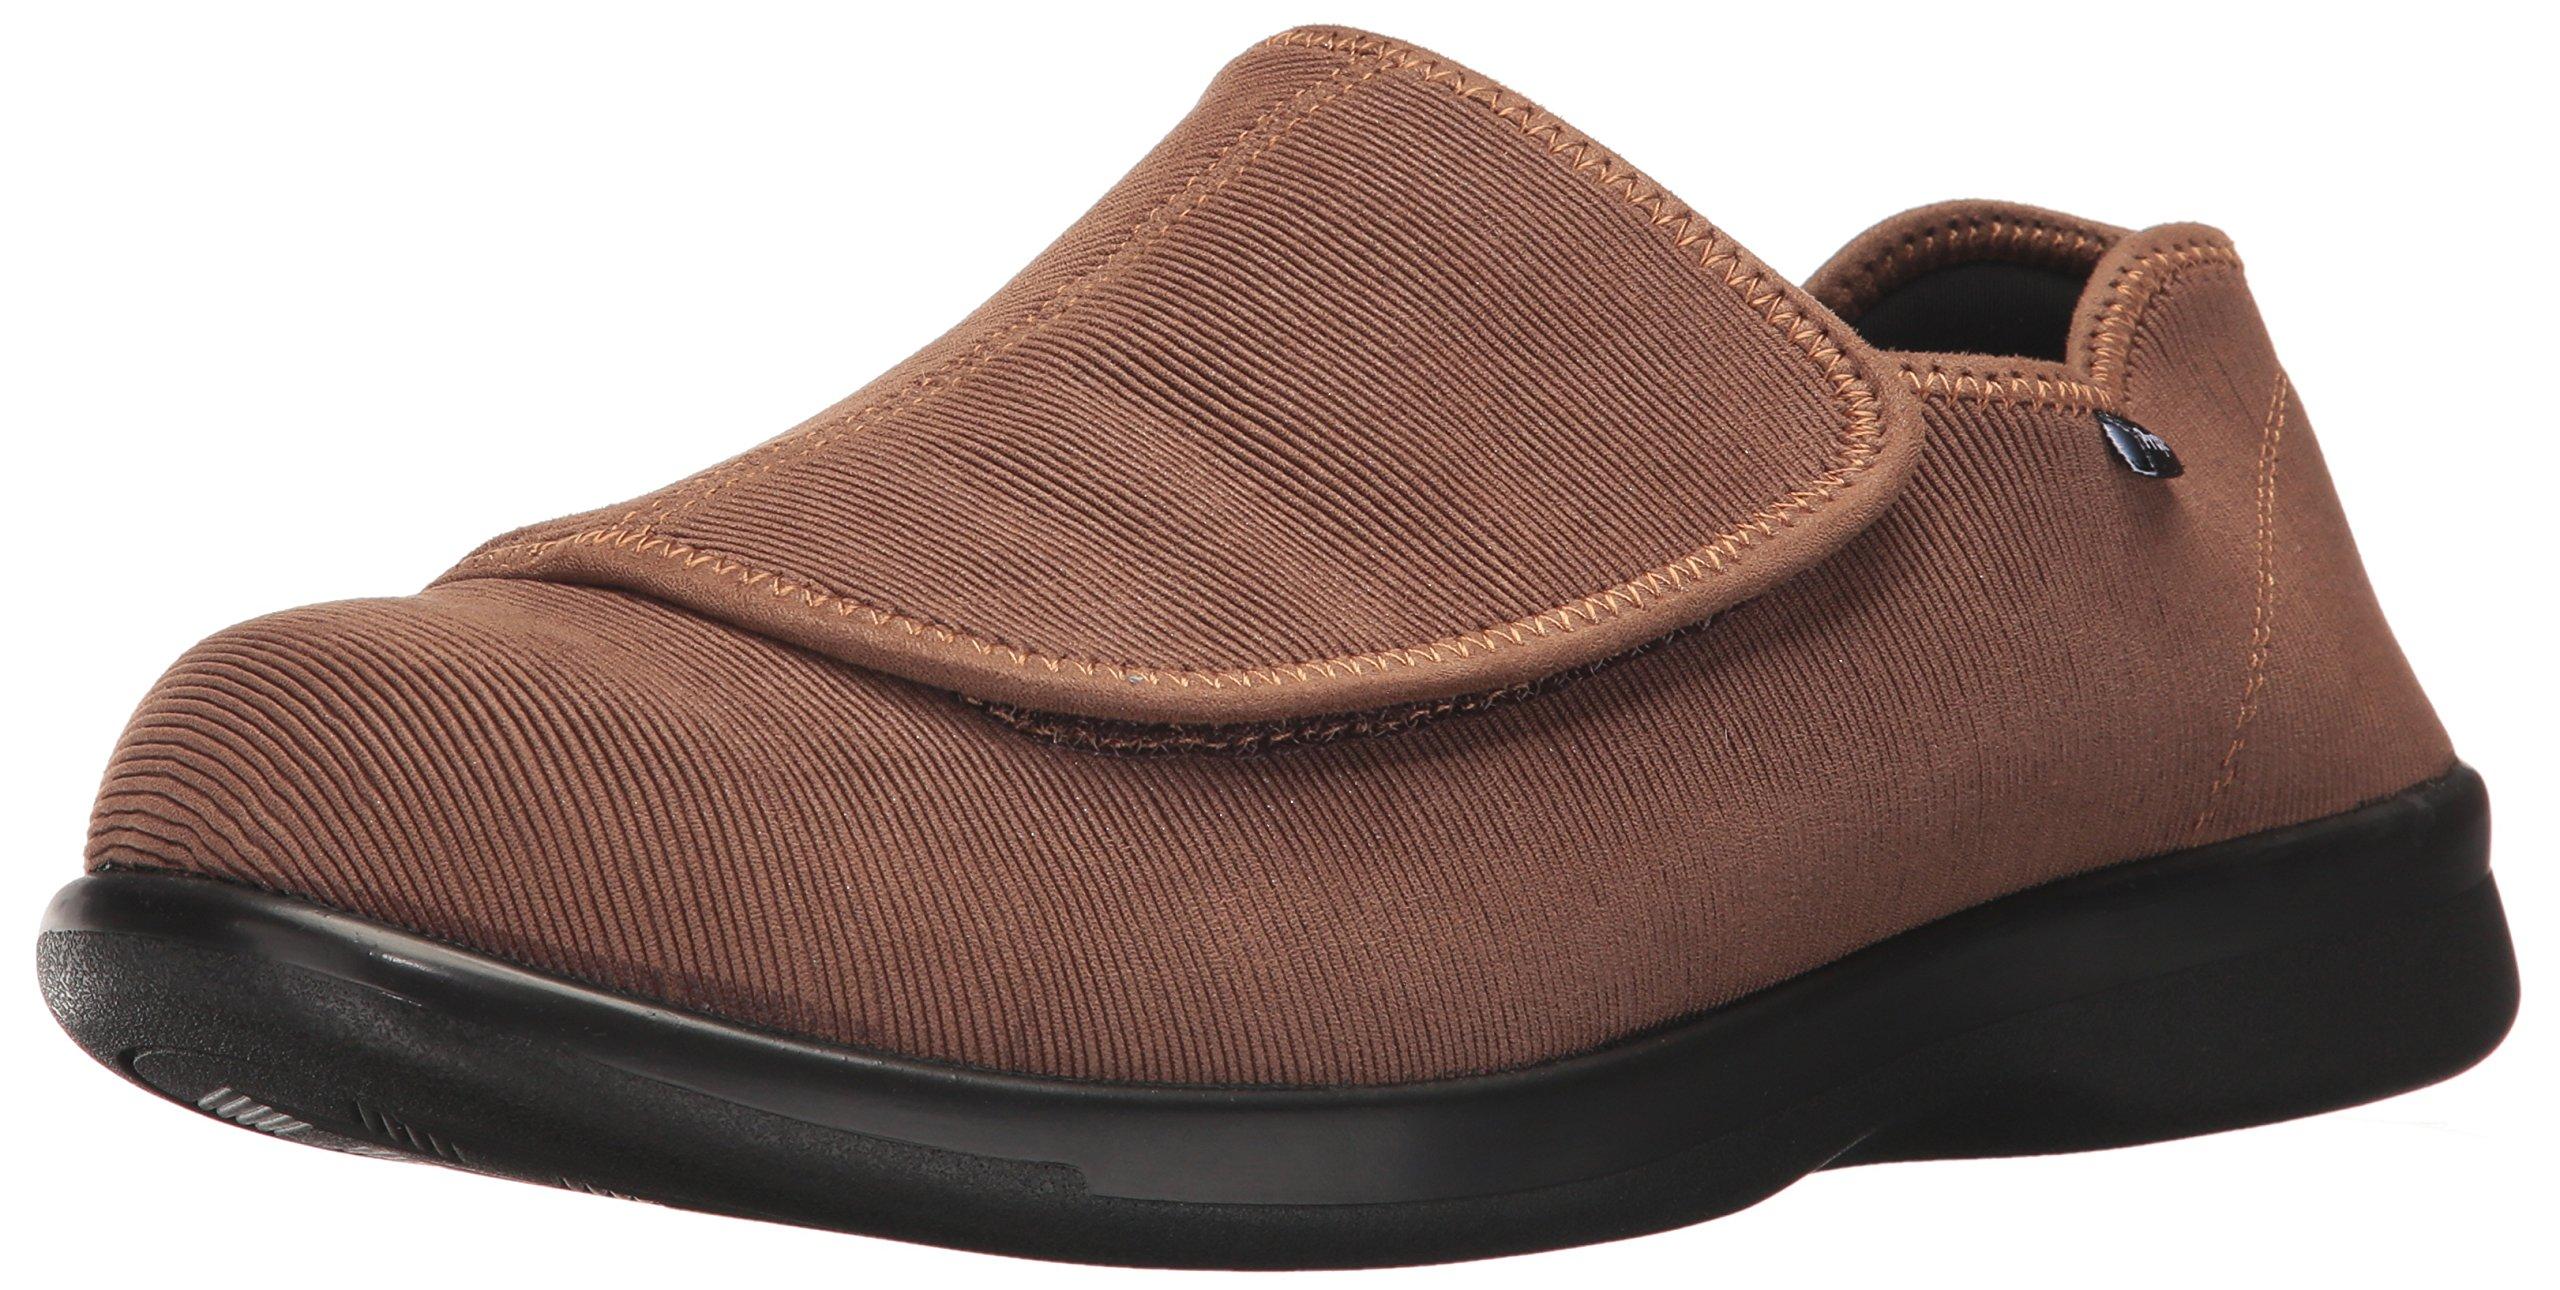 Propet Men's Cush N Foot Slipper, Sand Corduroy, 11.5 Medium US